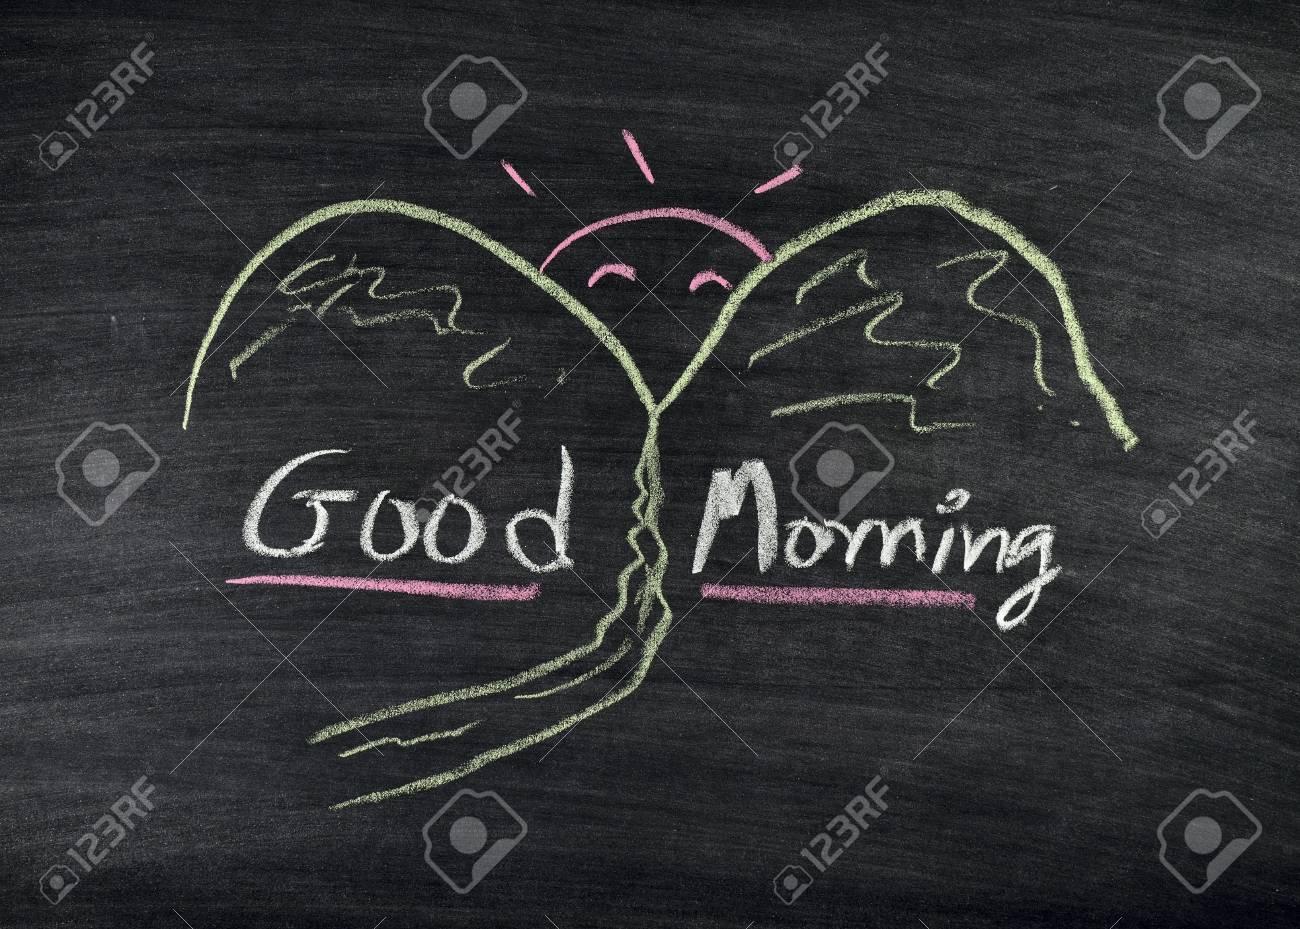 good morning title written on blackboard Stock Photo - 17926038